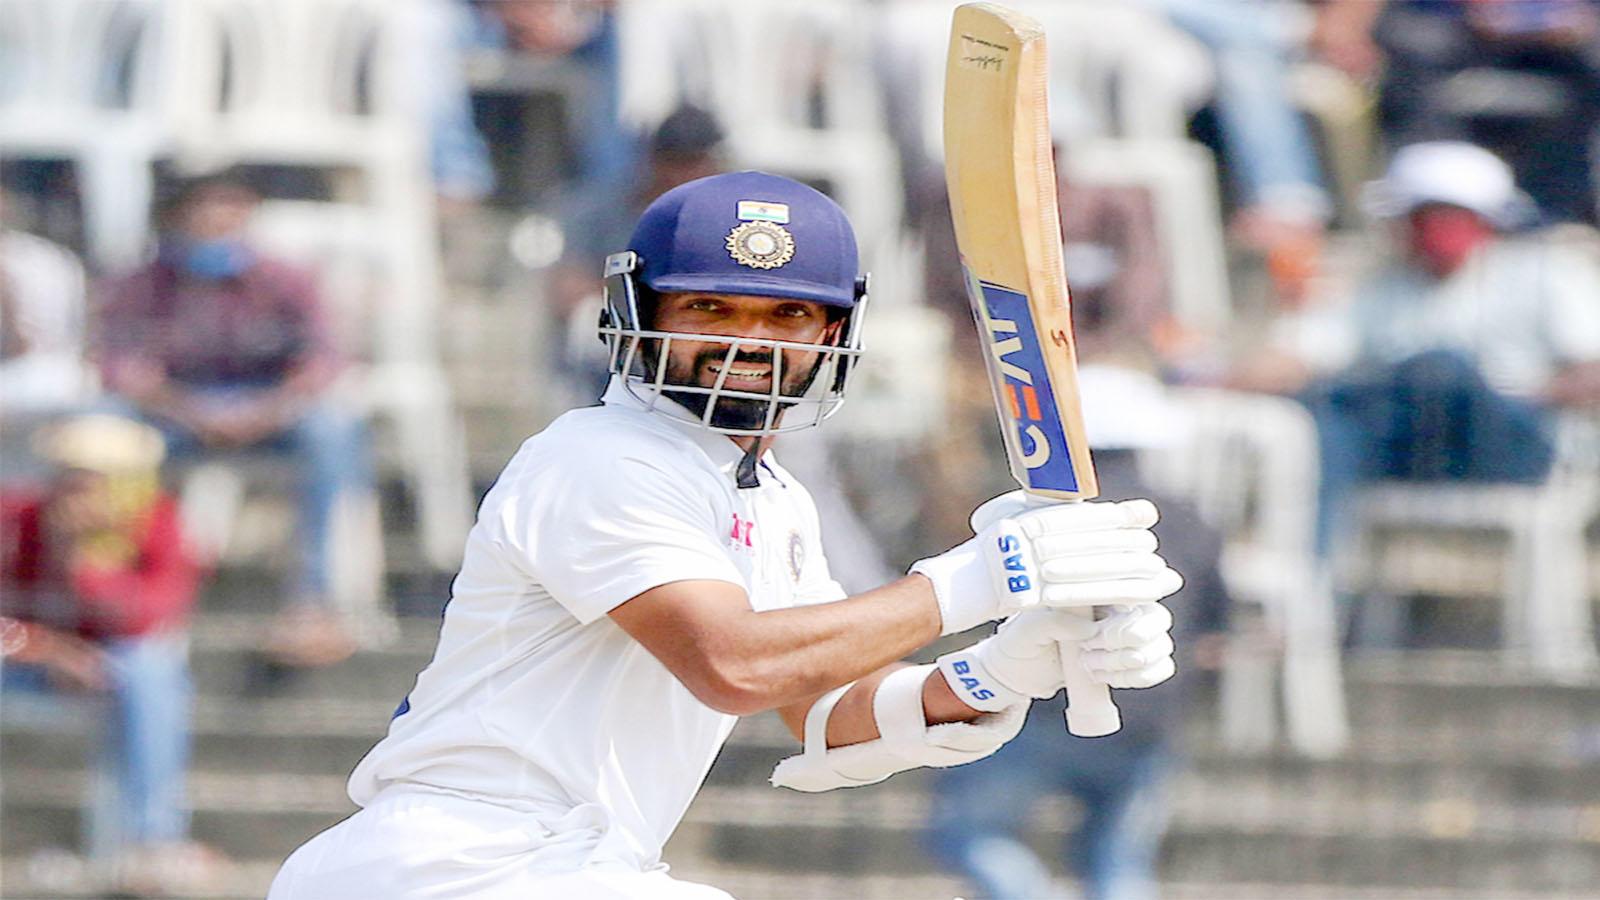 team-man-ajinkya-rahane-bats-for-himself-says-form-not-a-worry